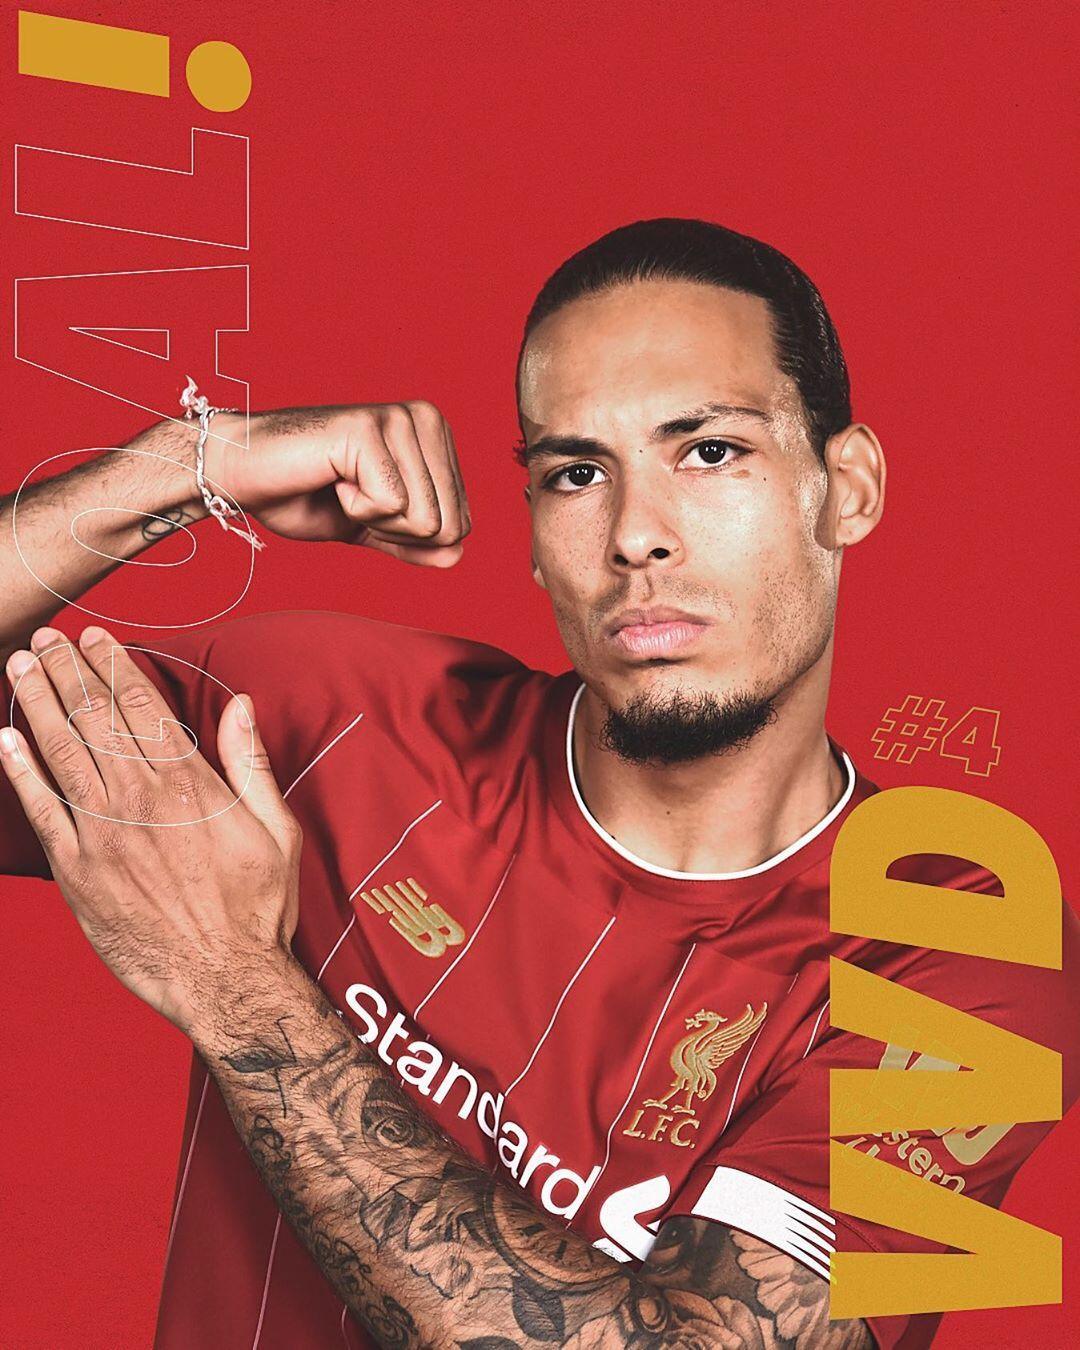 Liverpool Football Club on Instagram